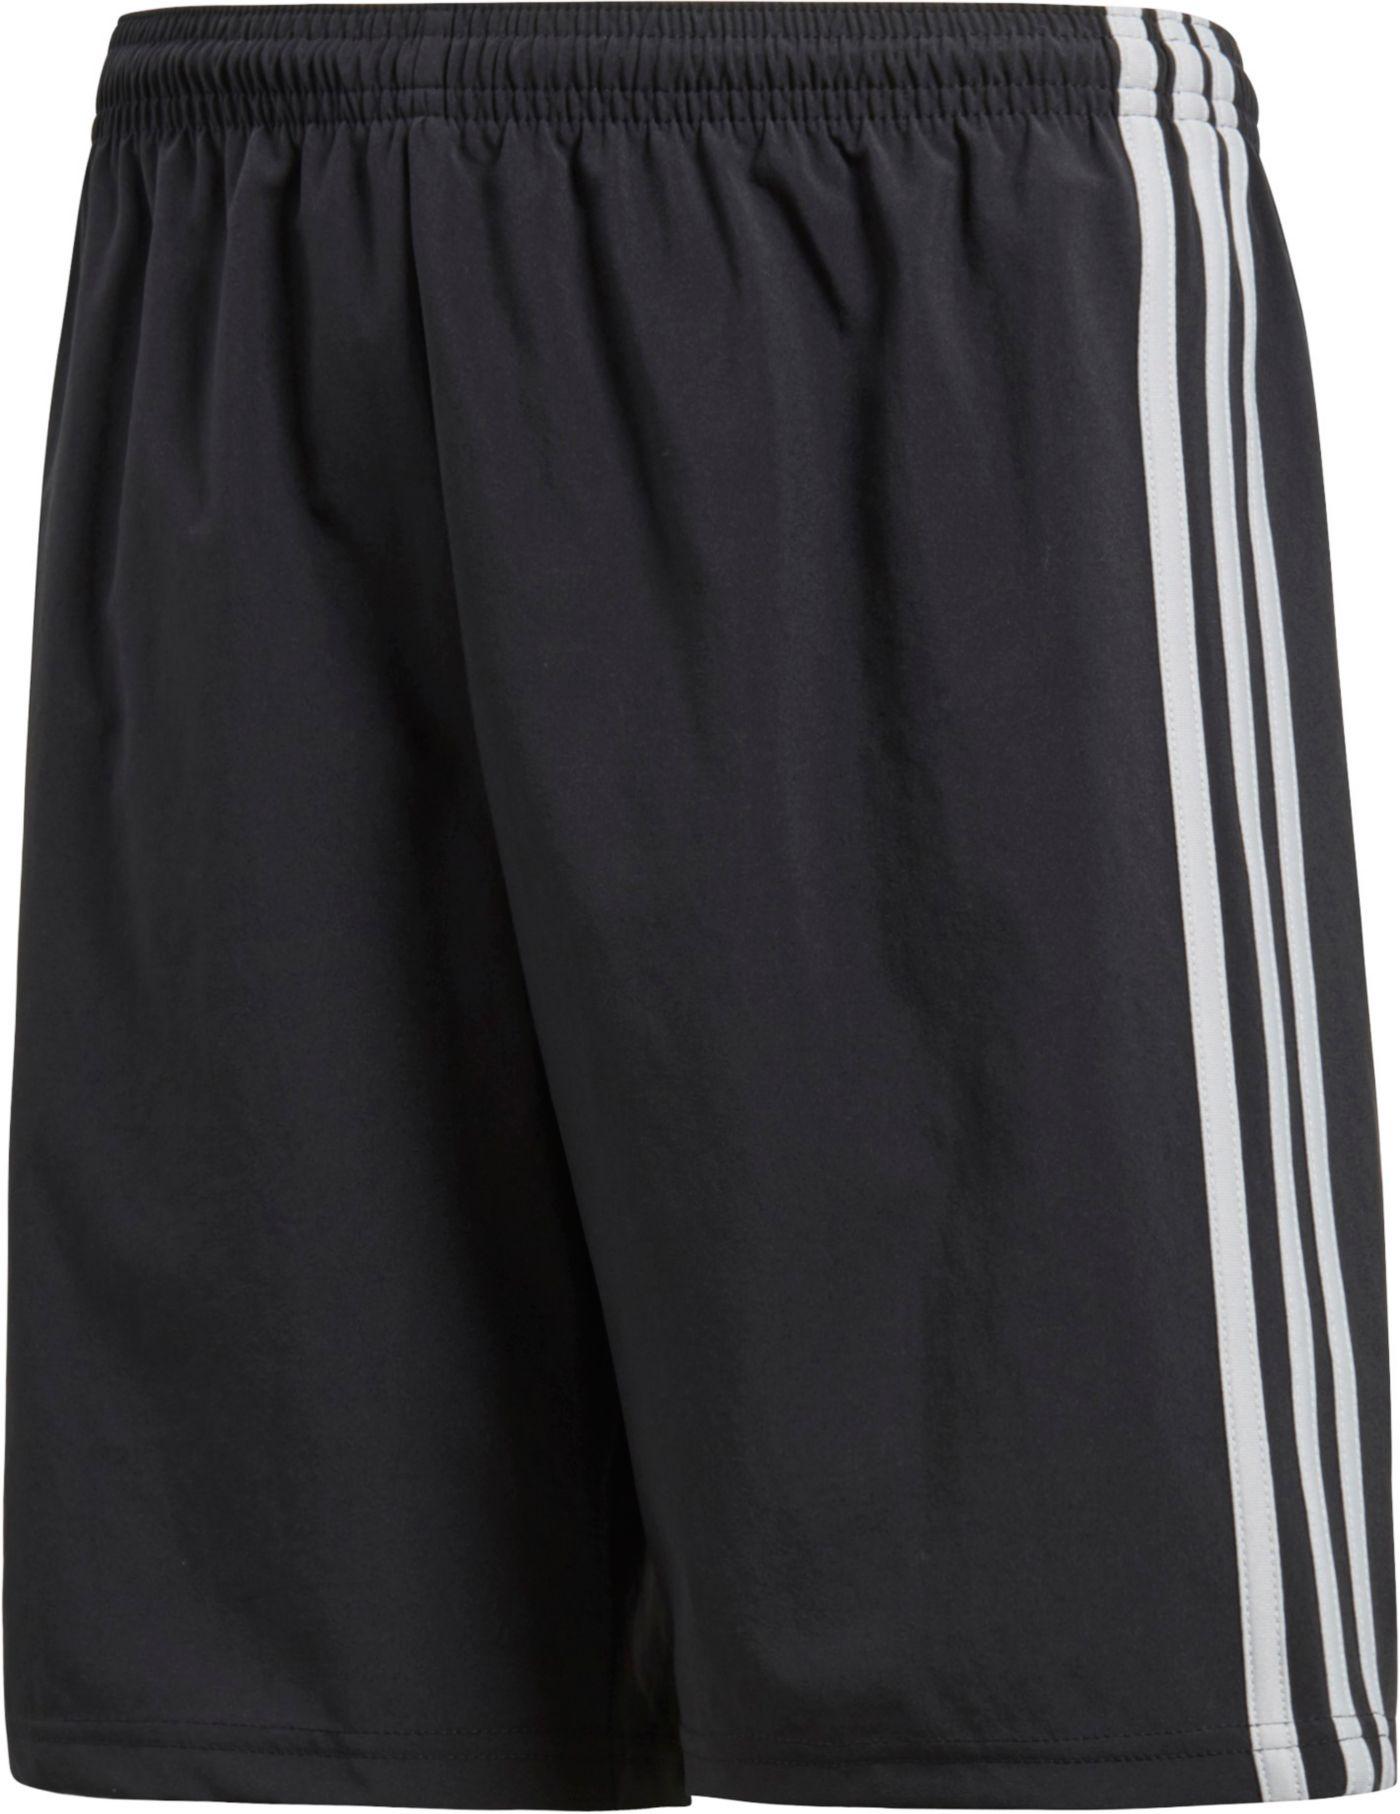 adidas Boys' Condivo 18 Shorts